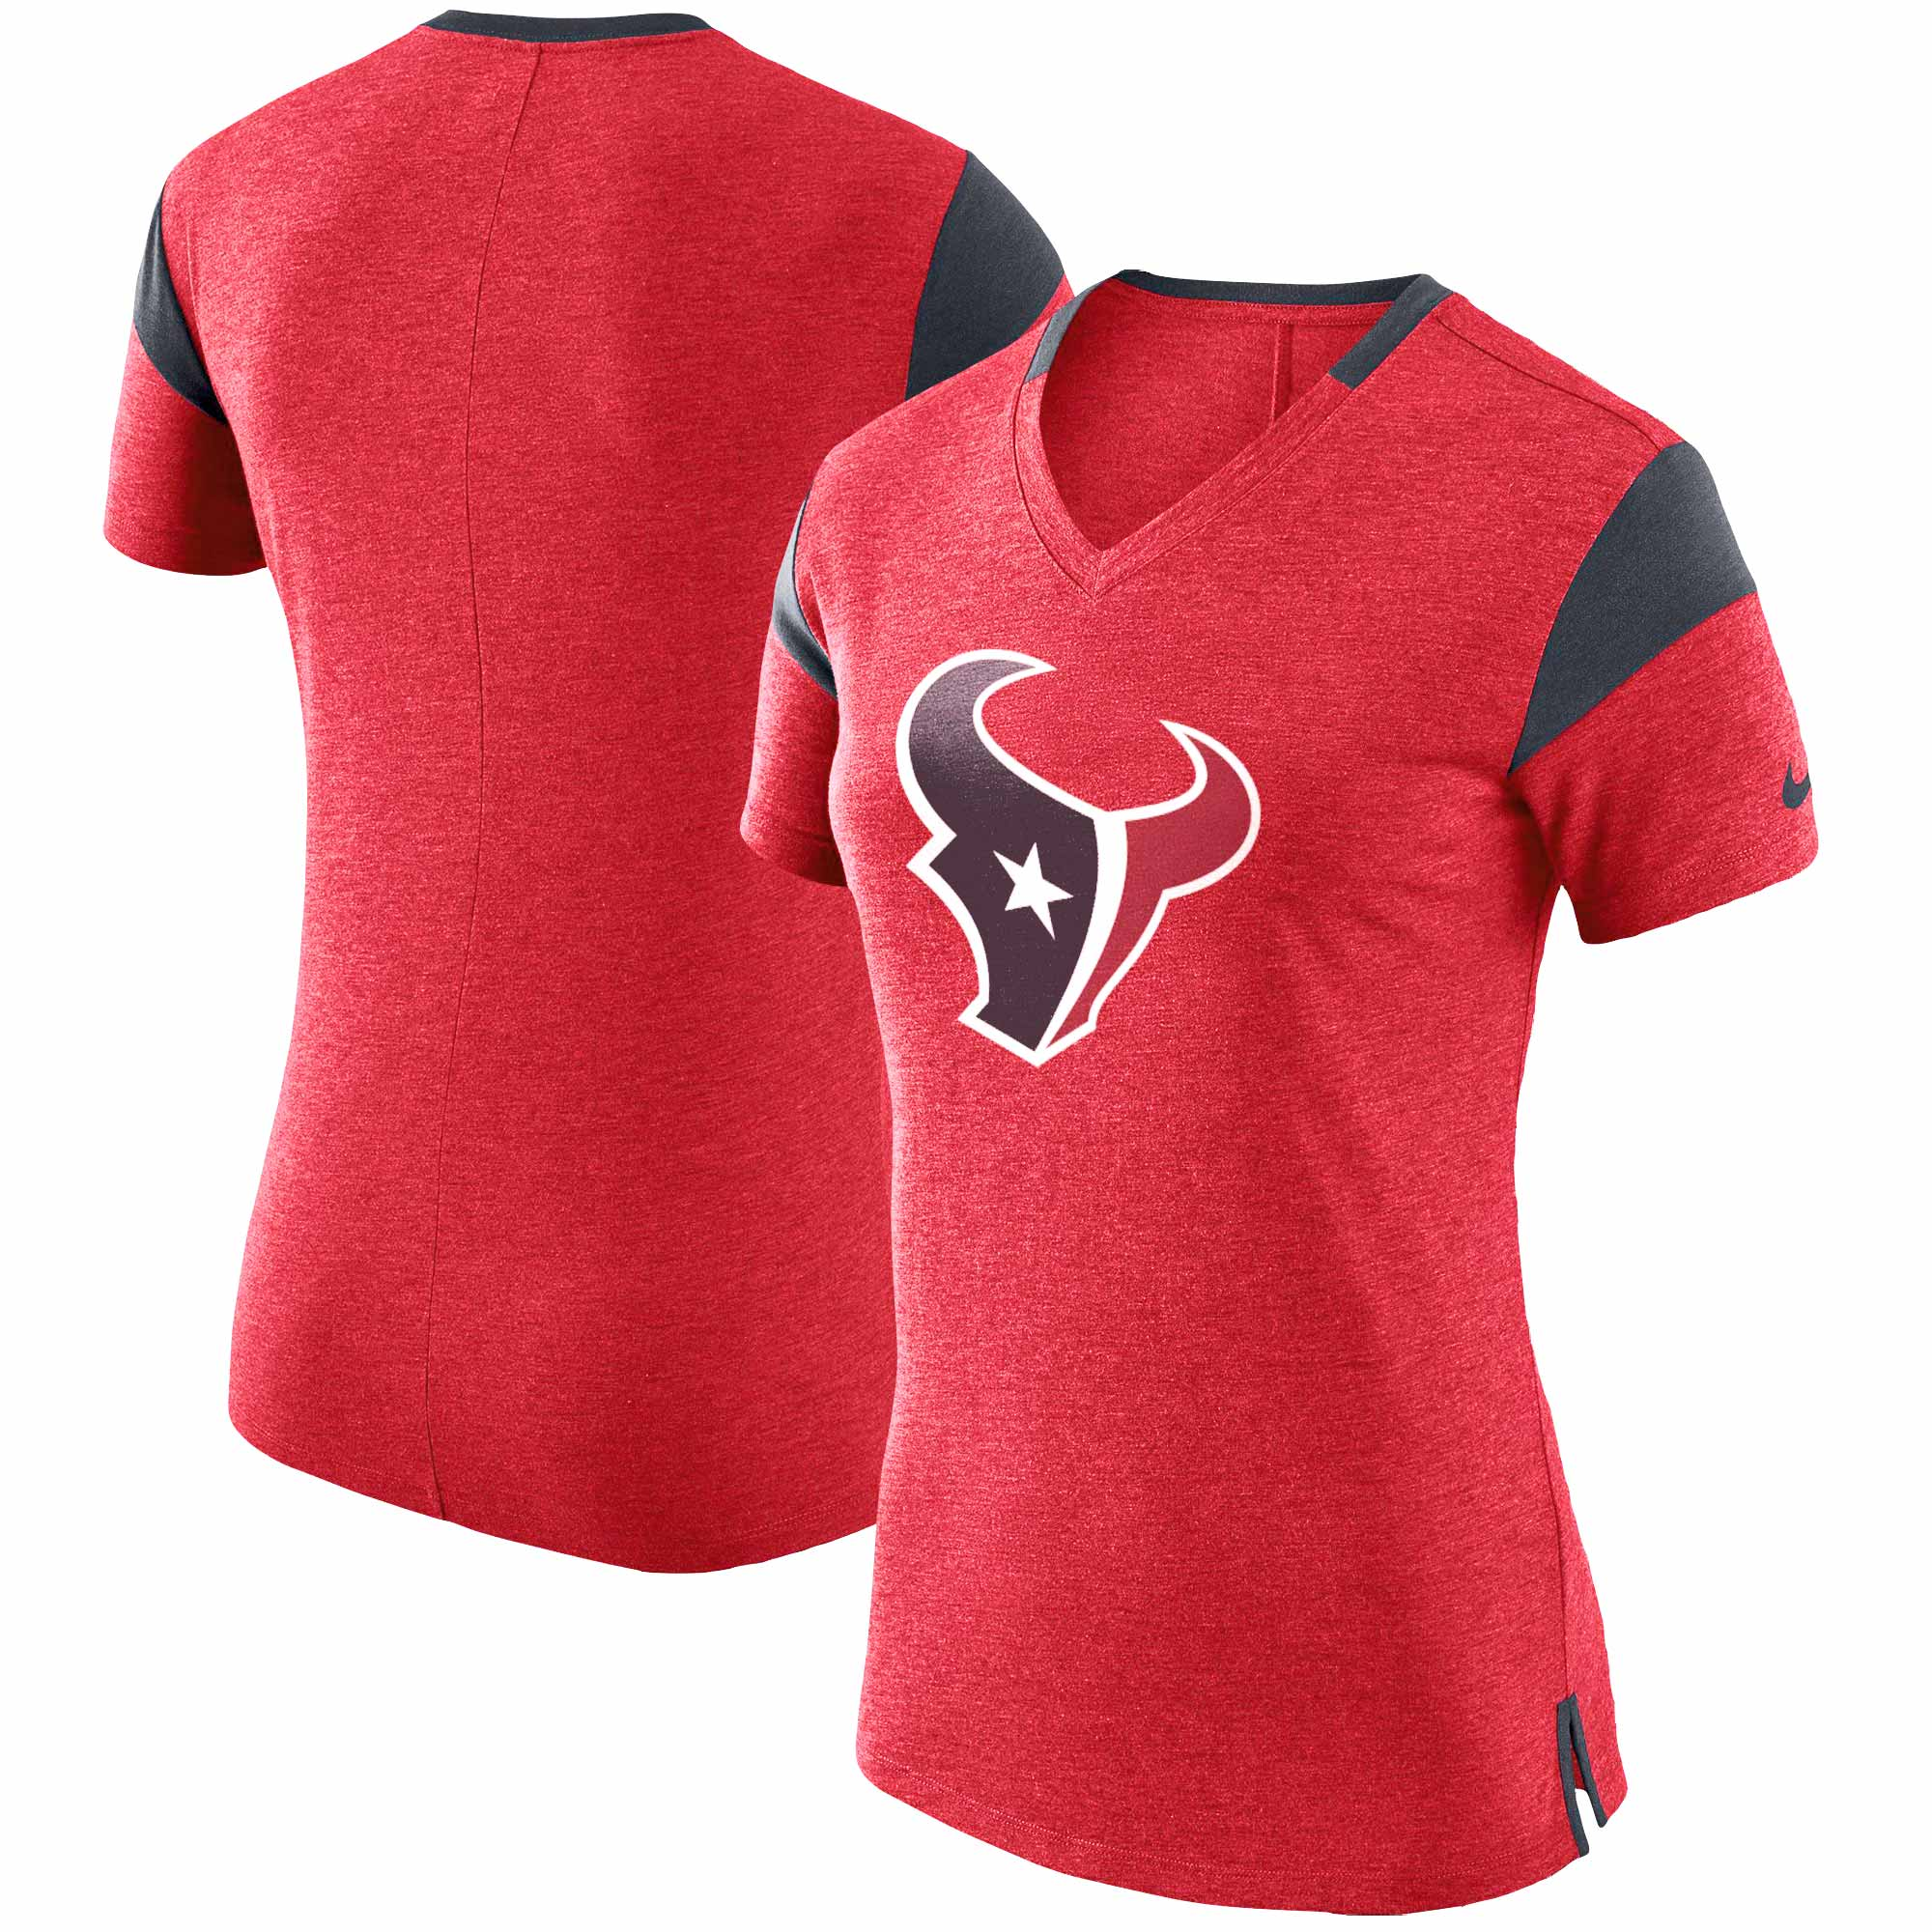 Houston Texans Nike Women's Fan V-Neck T-Shirt - Heathered Red